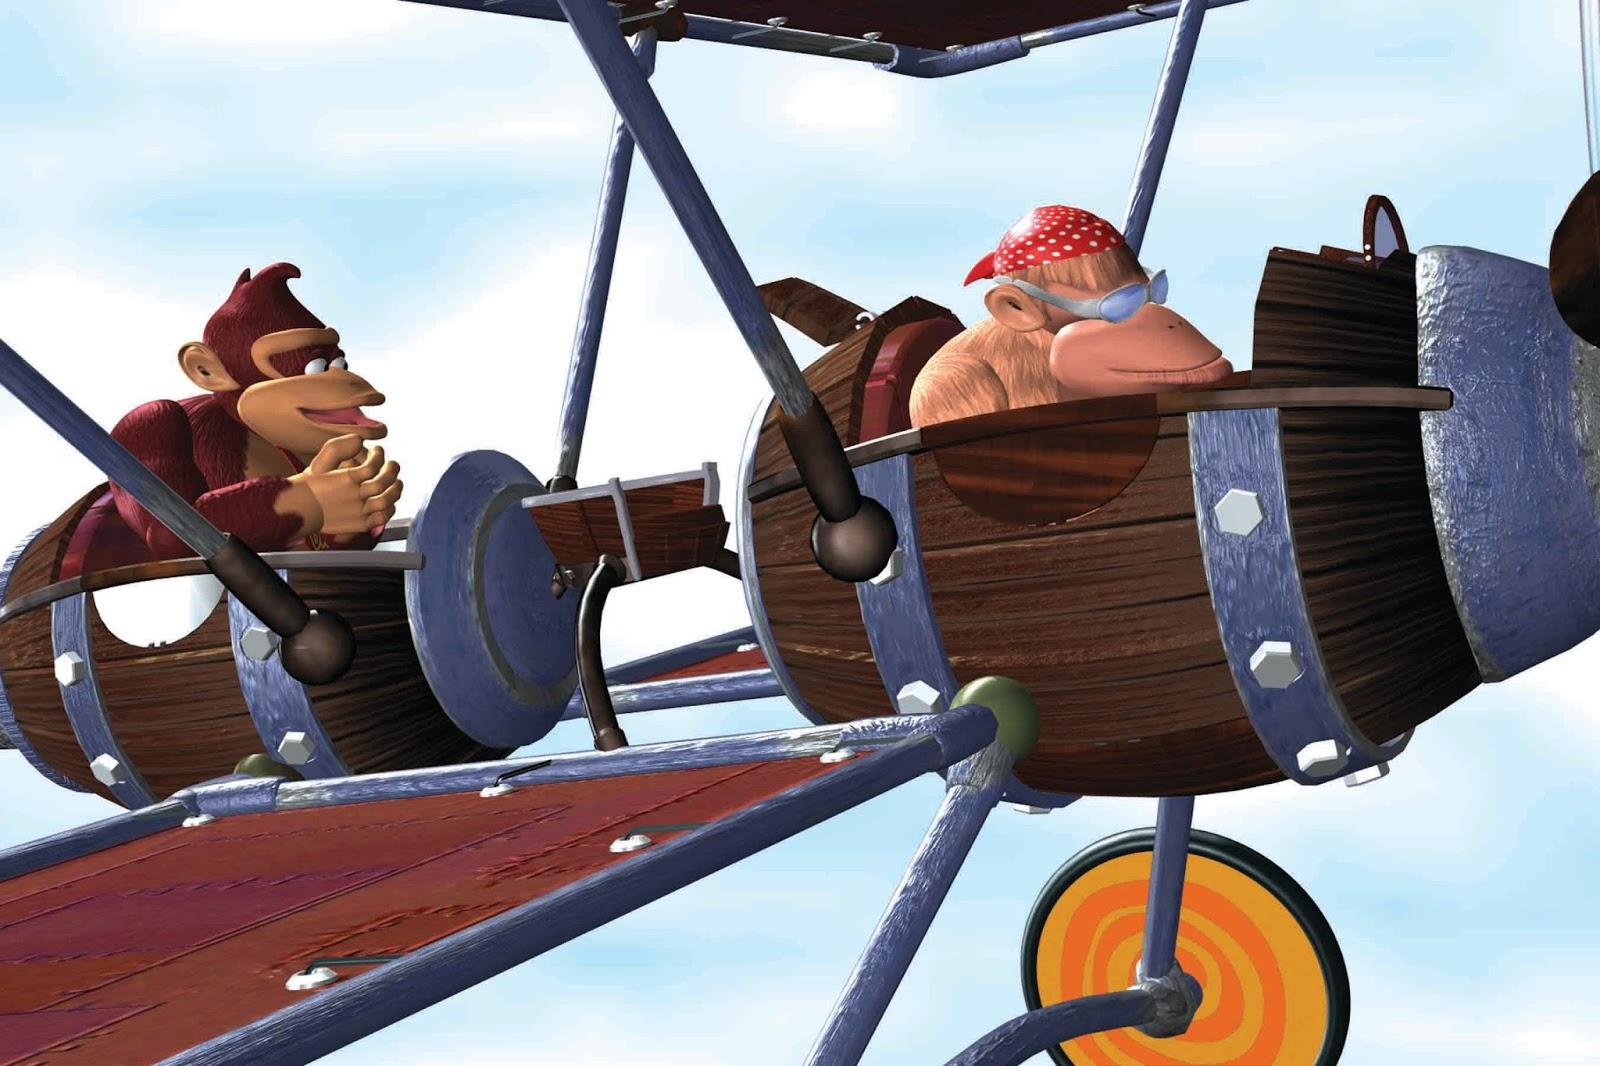 Donkey Kong movie